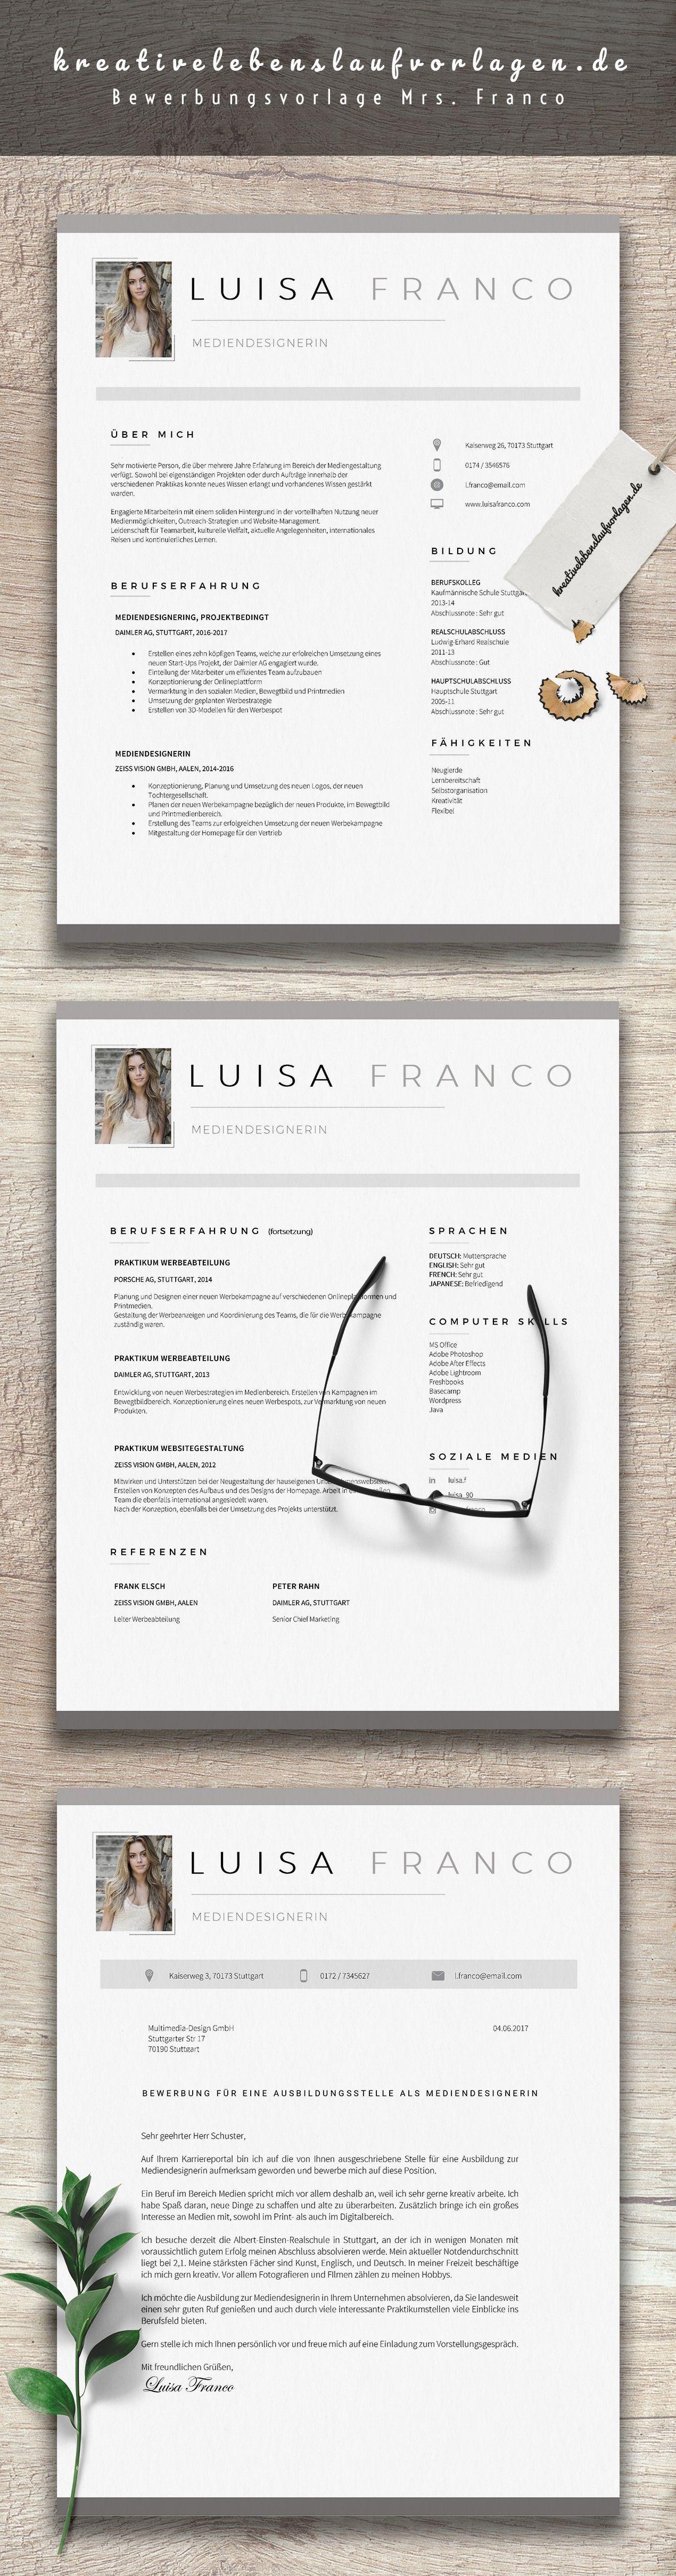 Mrs Franco Lebenslaufvorlagen Bewerbungsvorlagen Lebenslauf Lebenslauf Ideen Lebenslaufvorlage